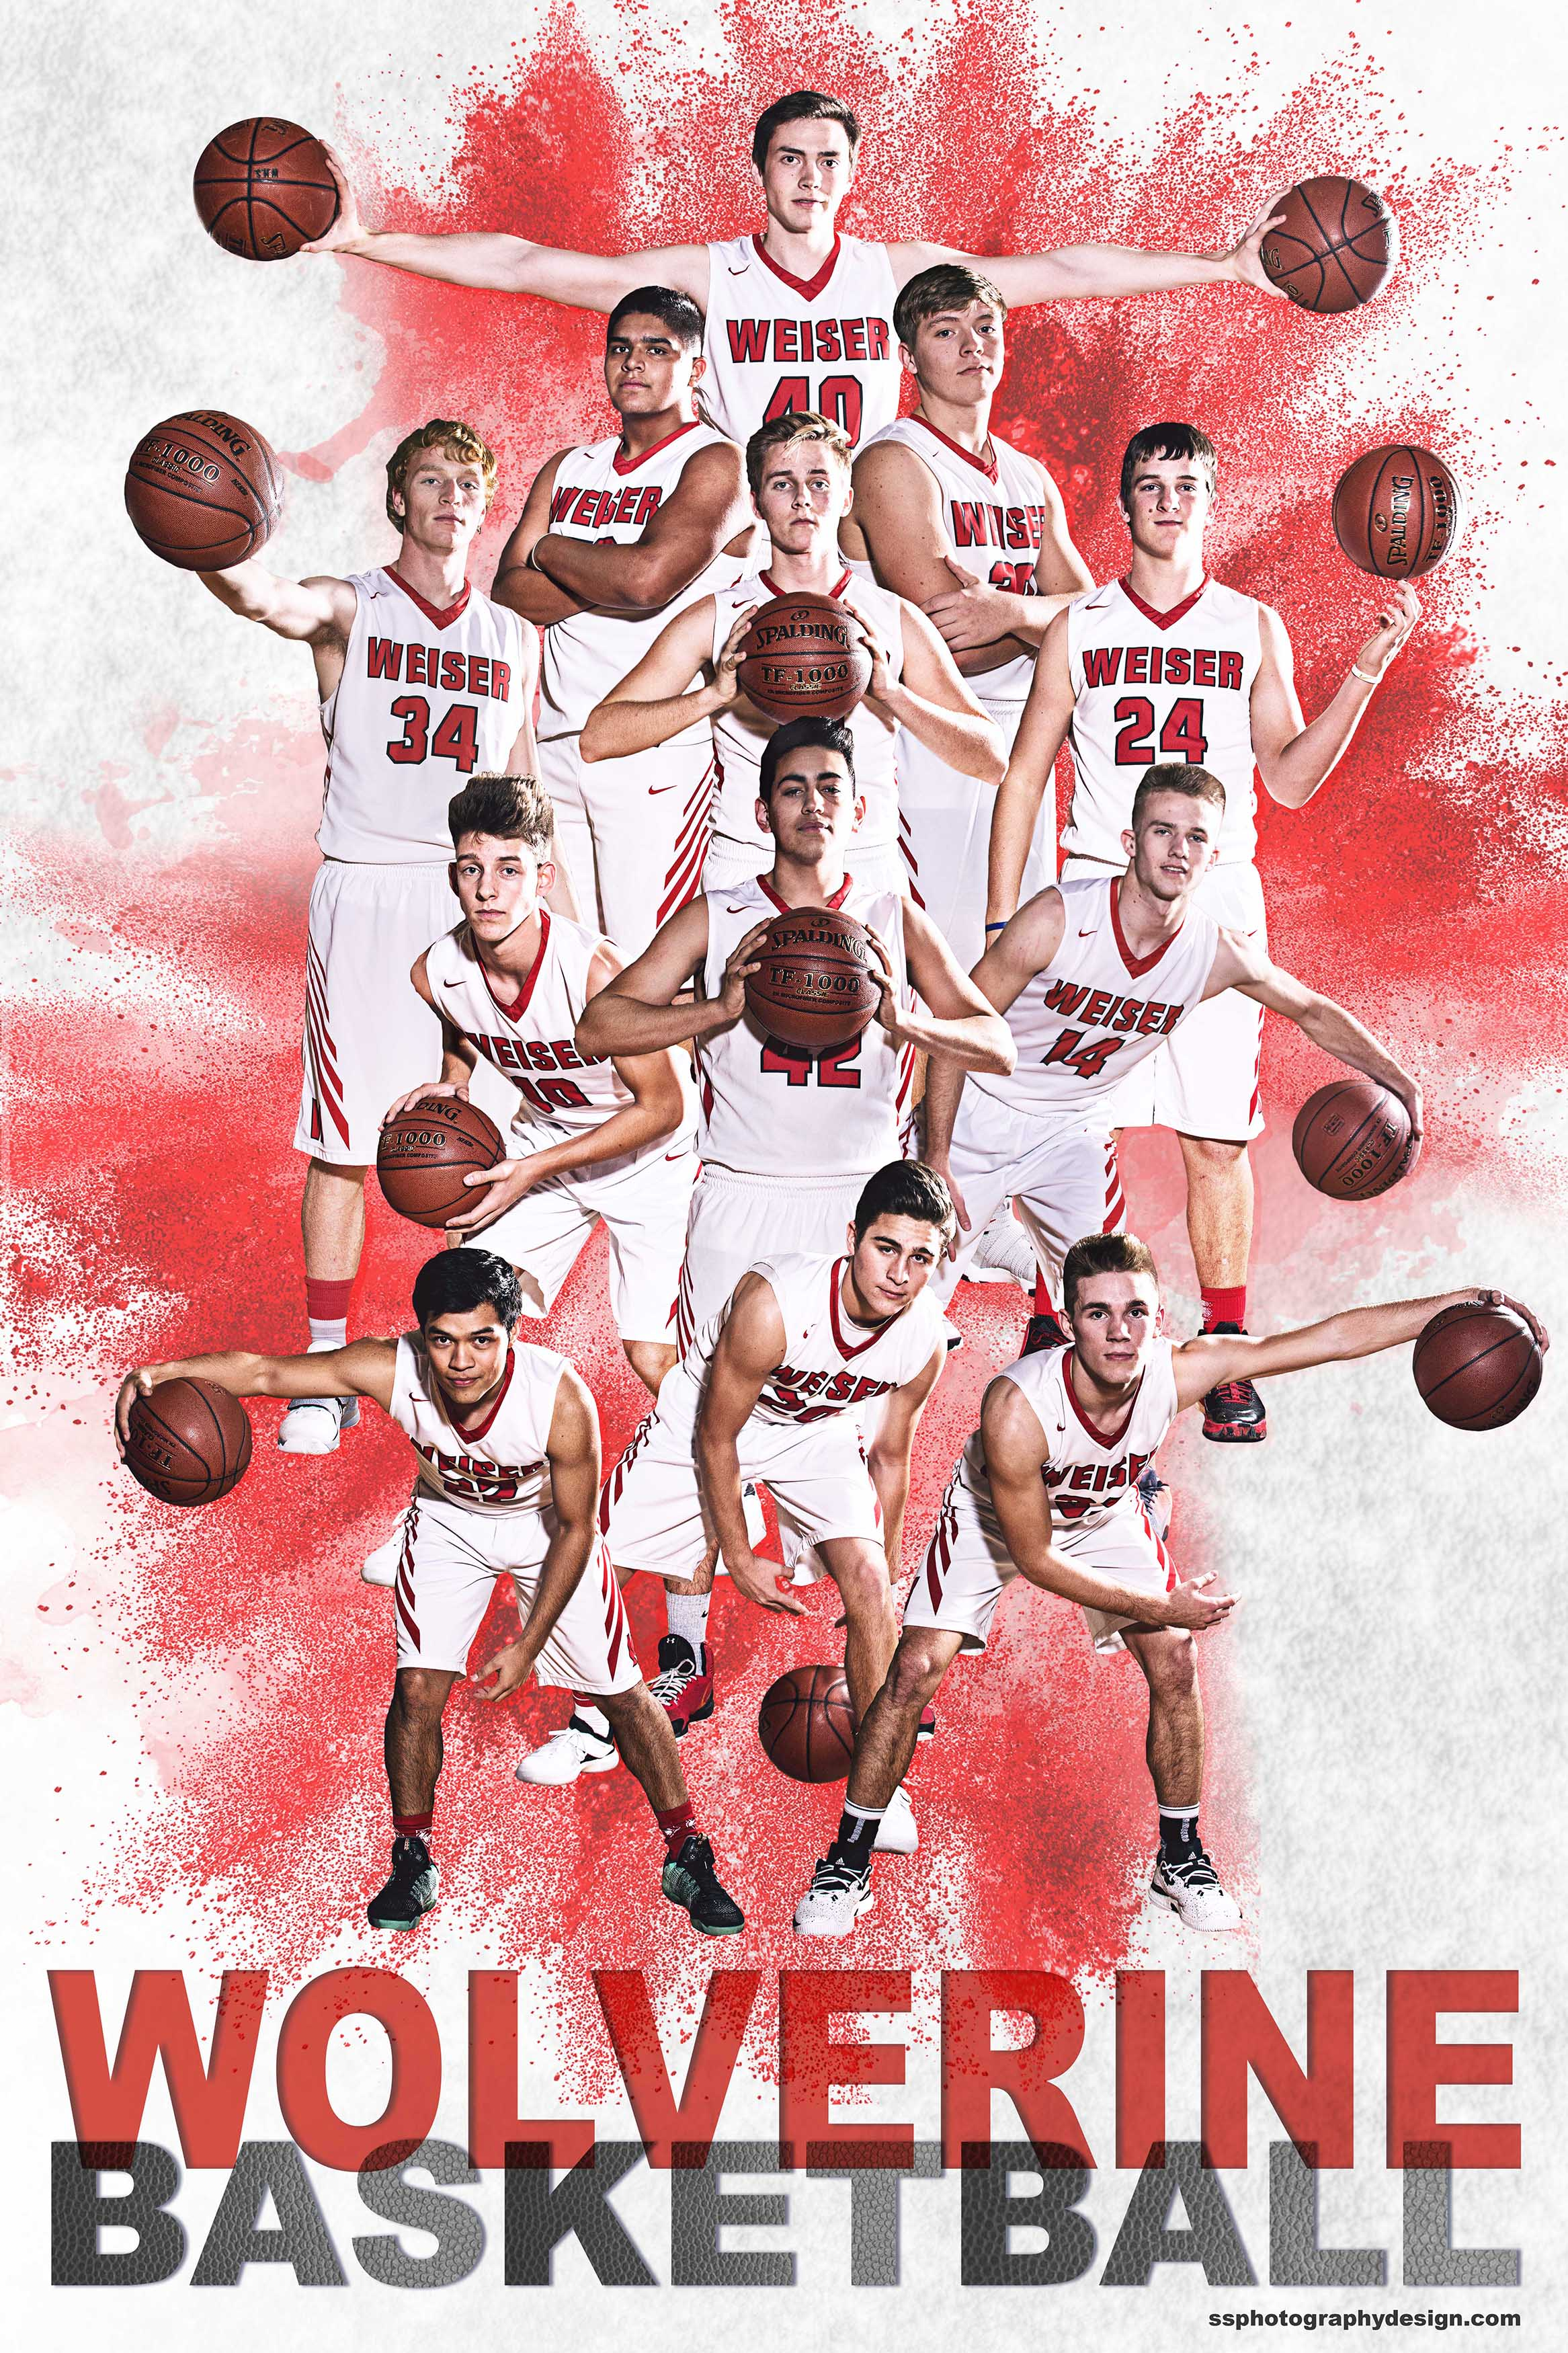 WHS Boys Basketball 2017-18 team photography, lighting, and composite.